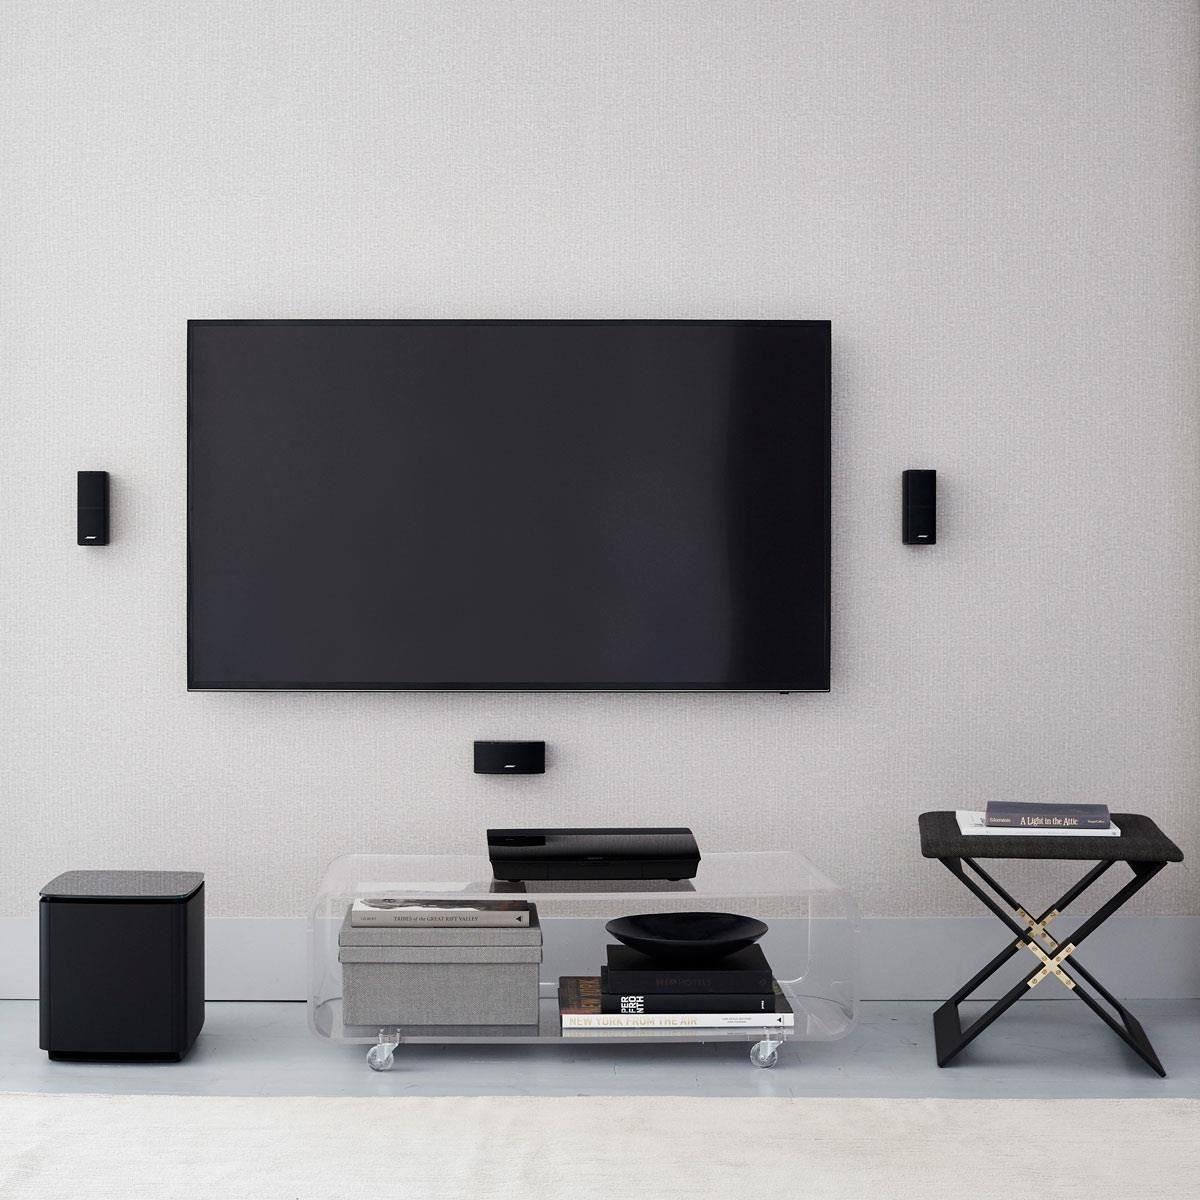 Bose Lifestyle 600 家庭娛樂系統